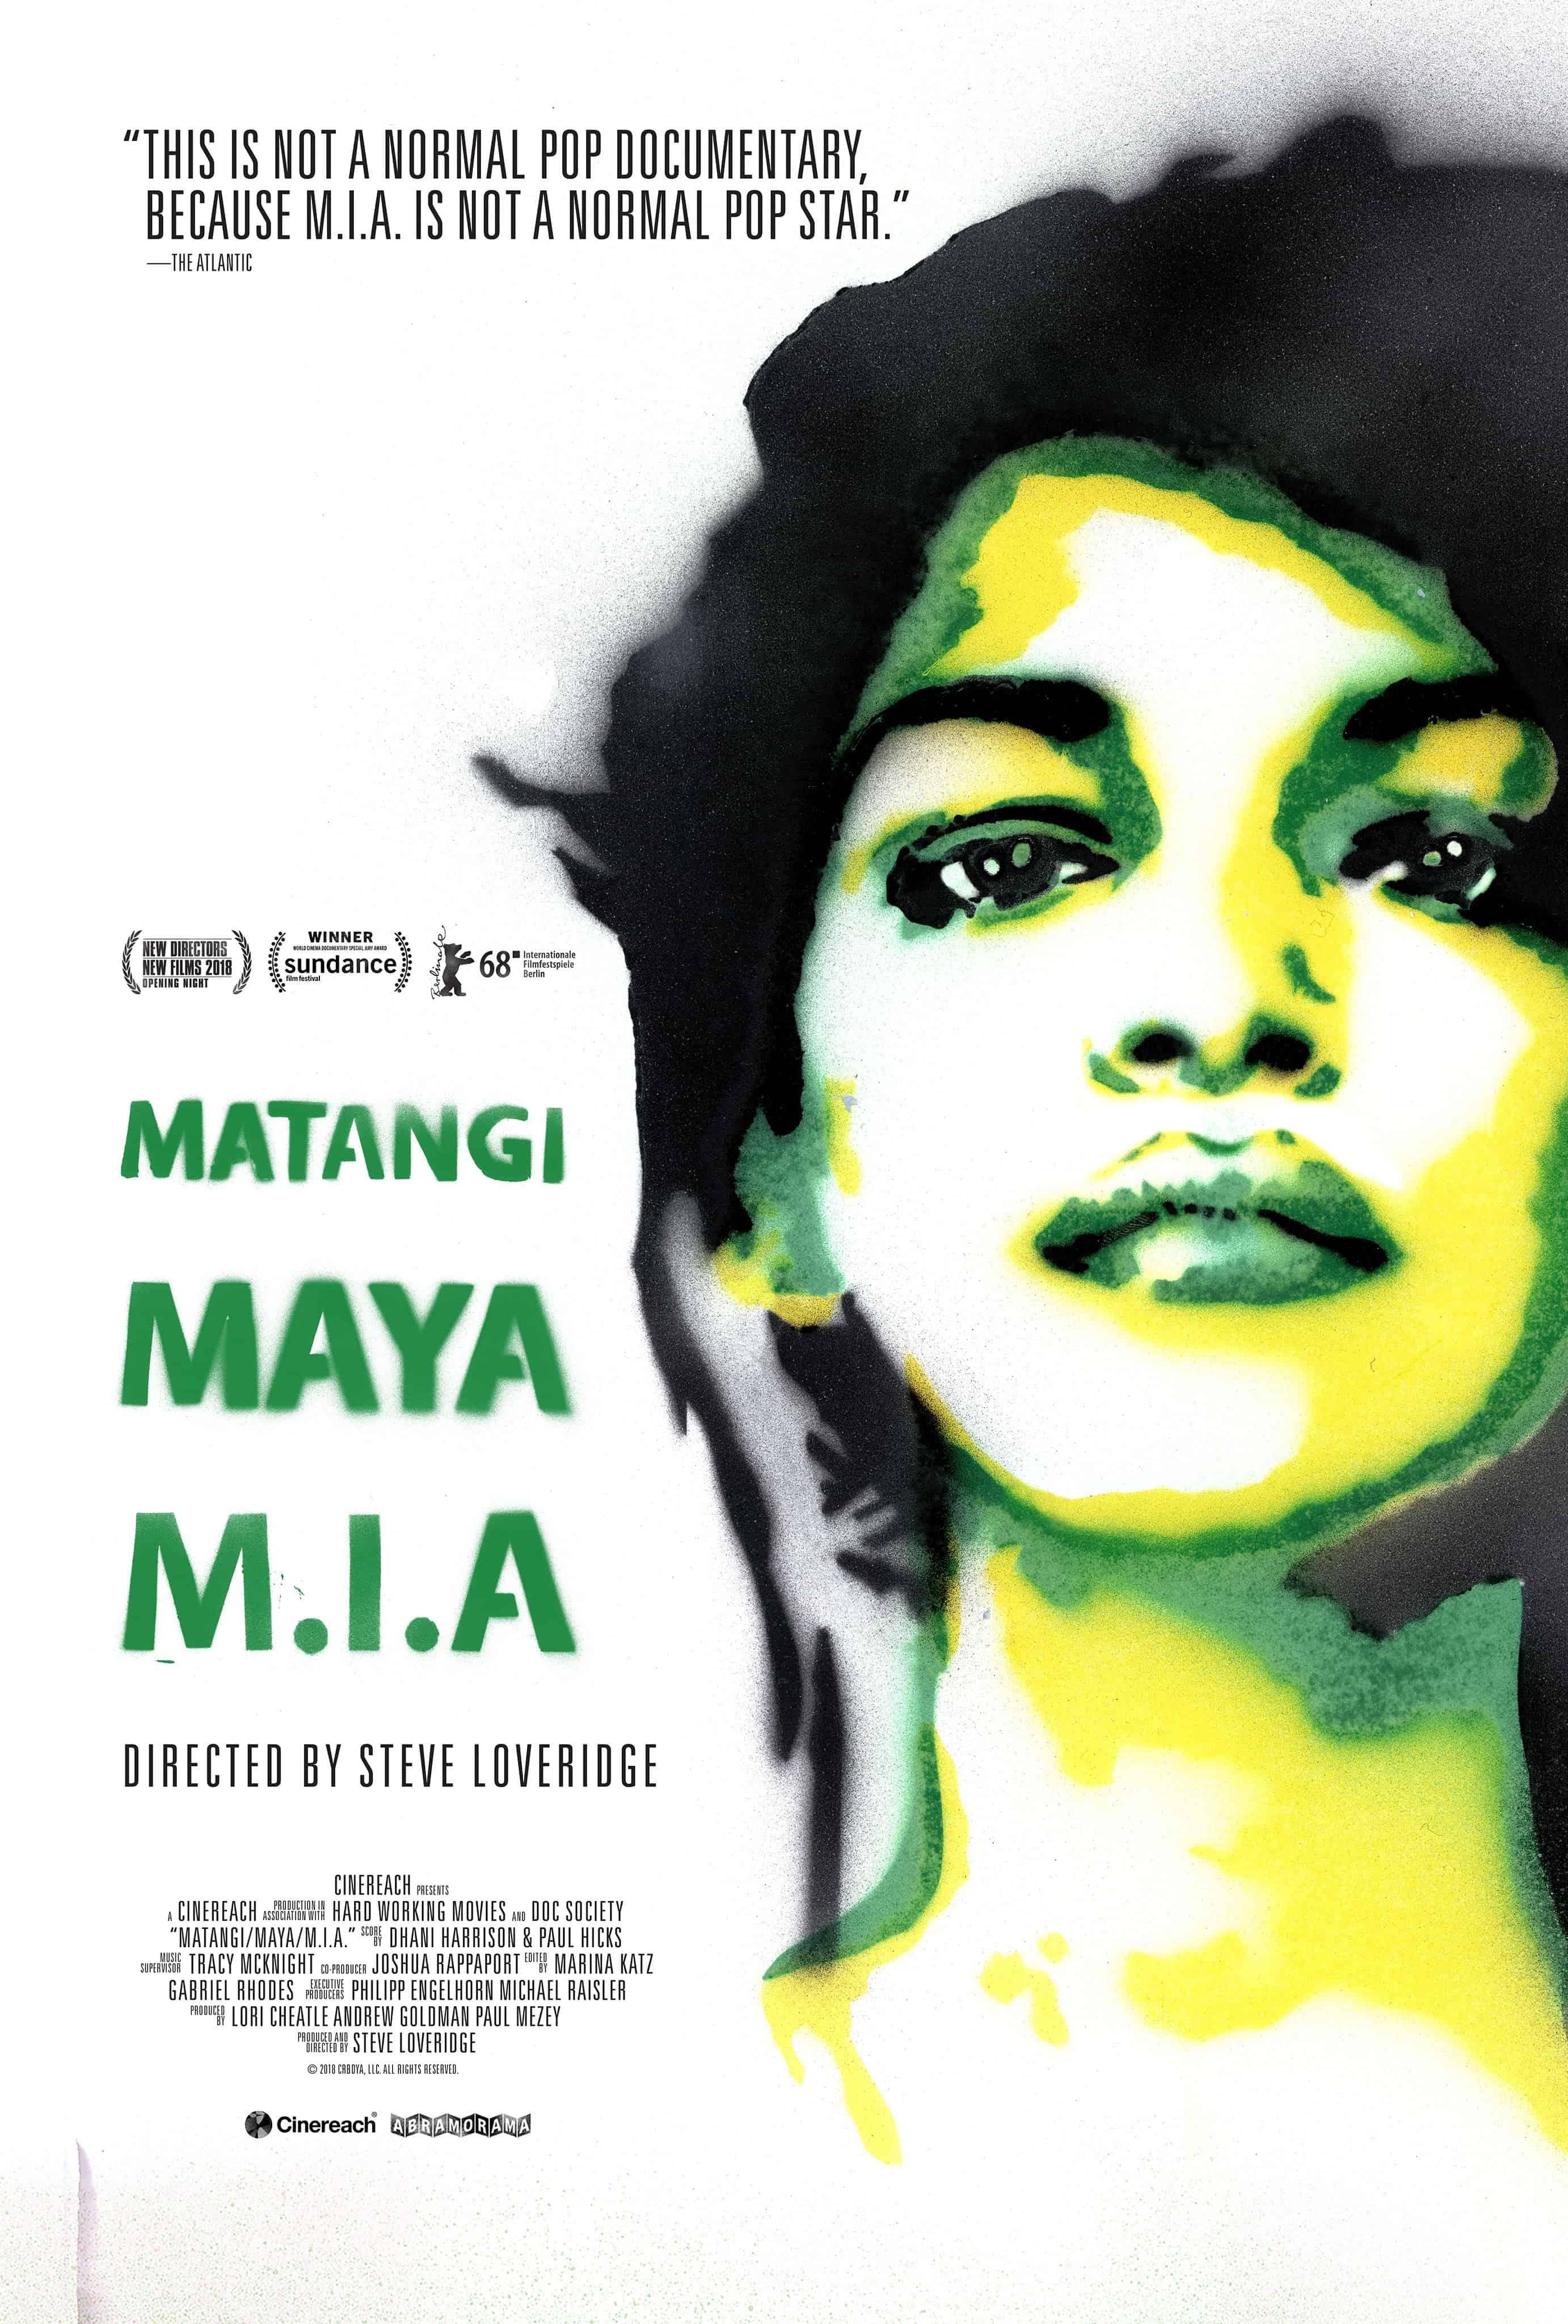 MATANGI / MAYA / M.I.A. Gets a Trailer 1